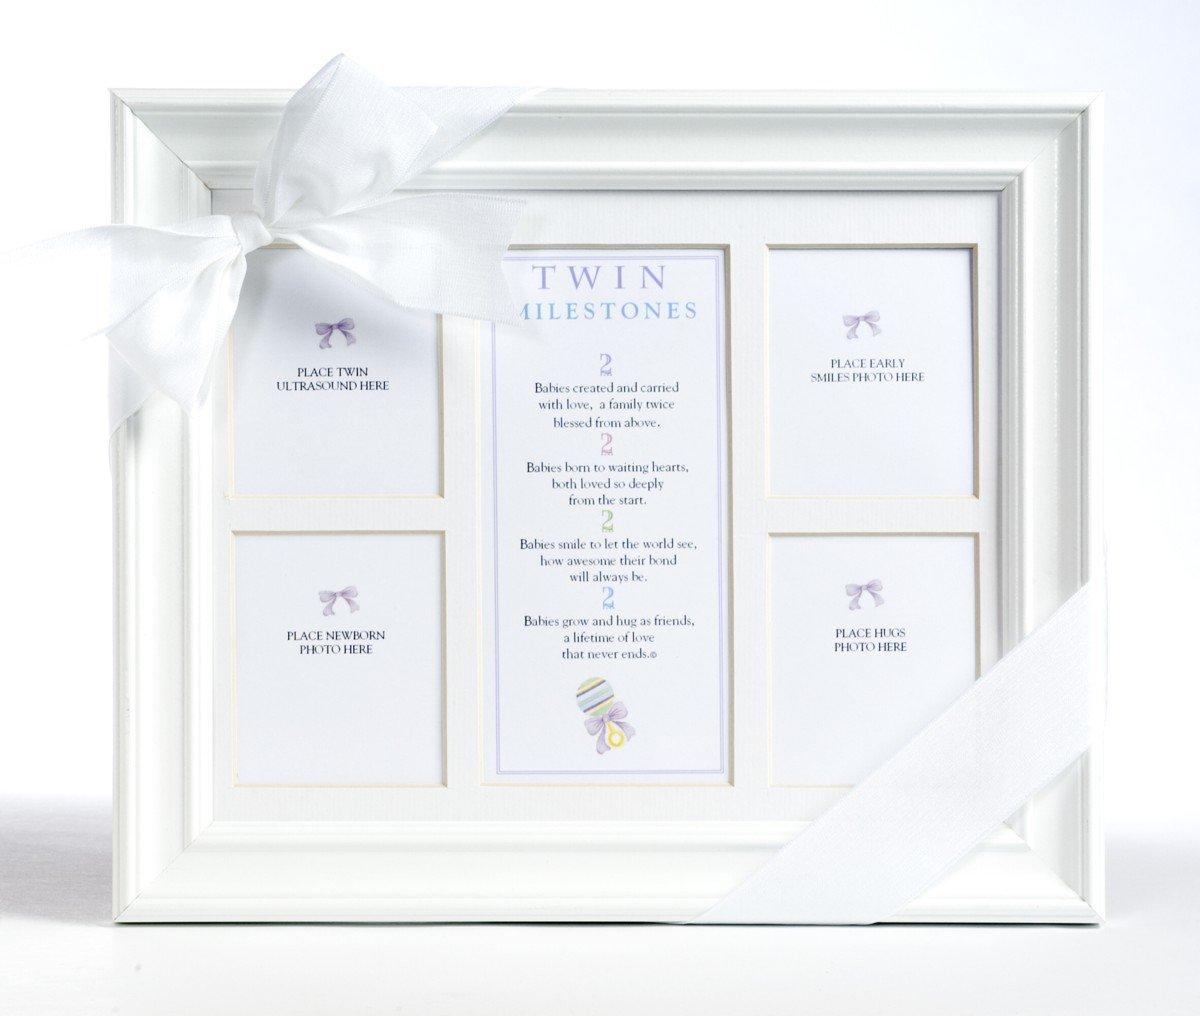 Amazon.com : The Grandparent Gift Co. 8x10 Twins Milestones Frame ...